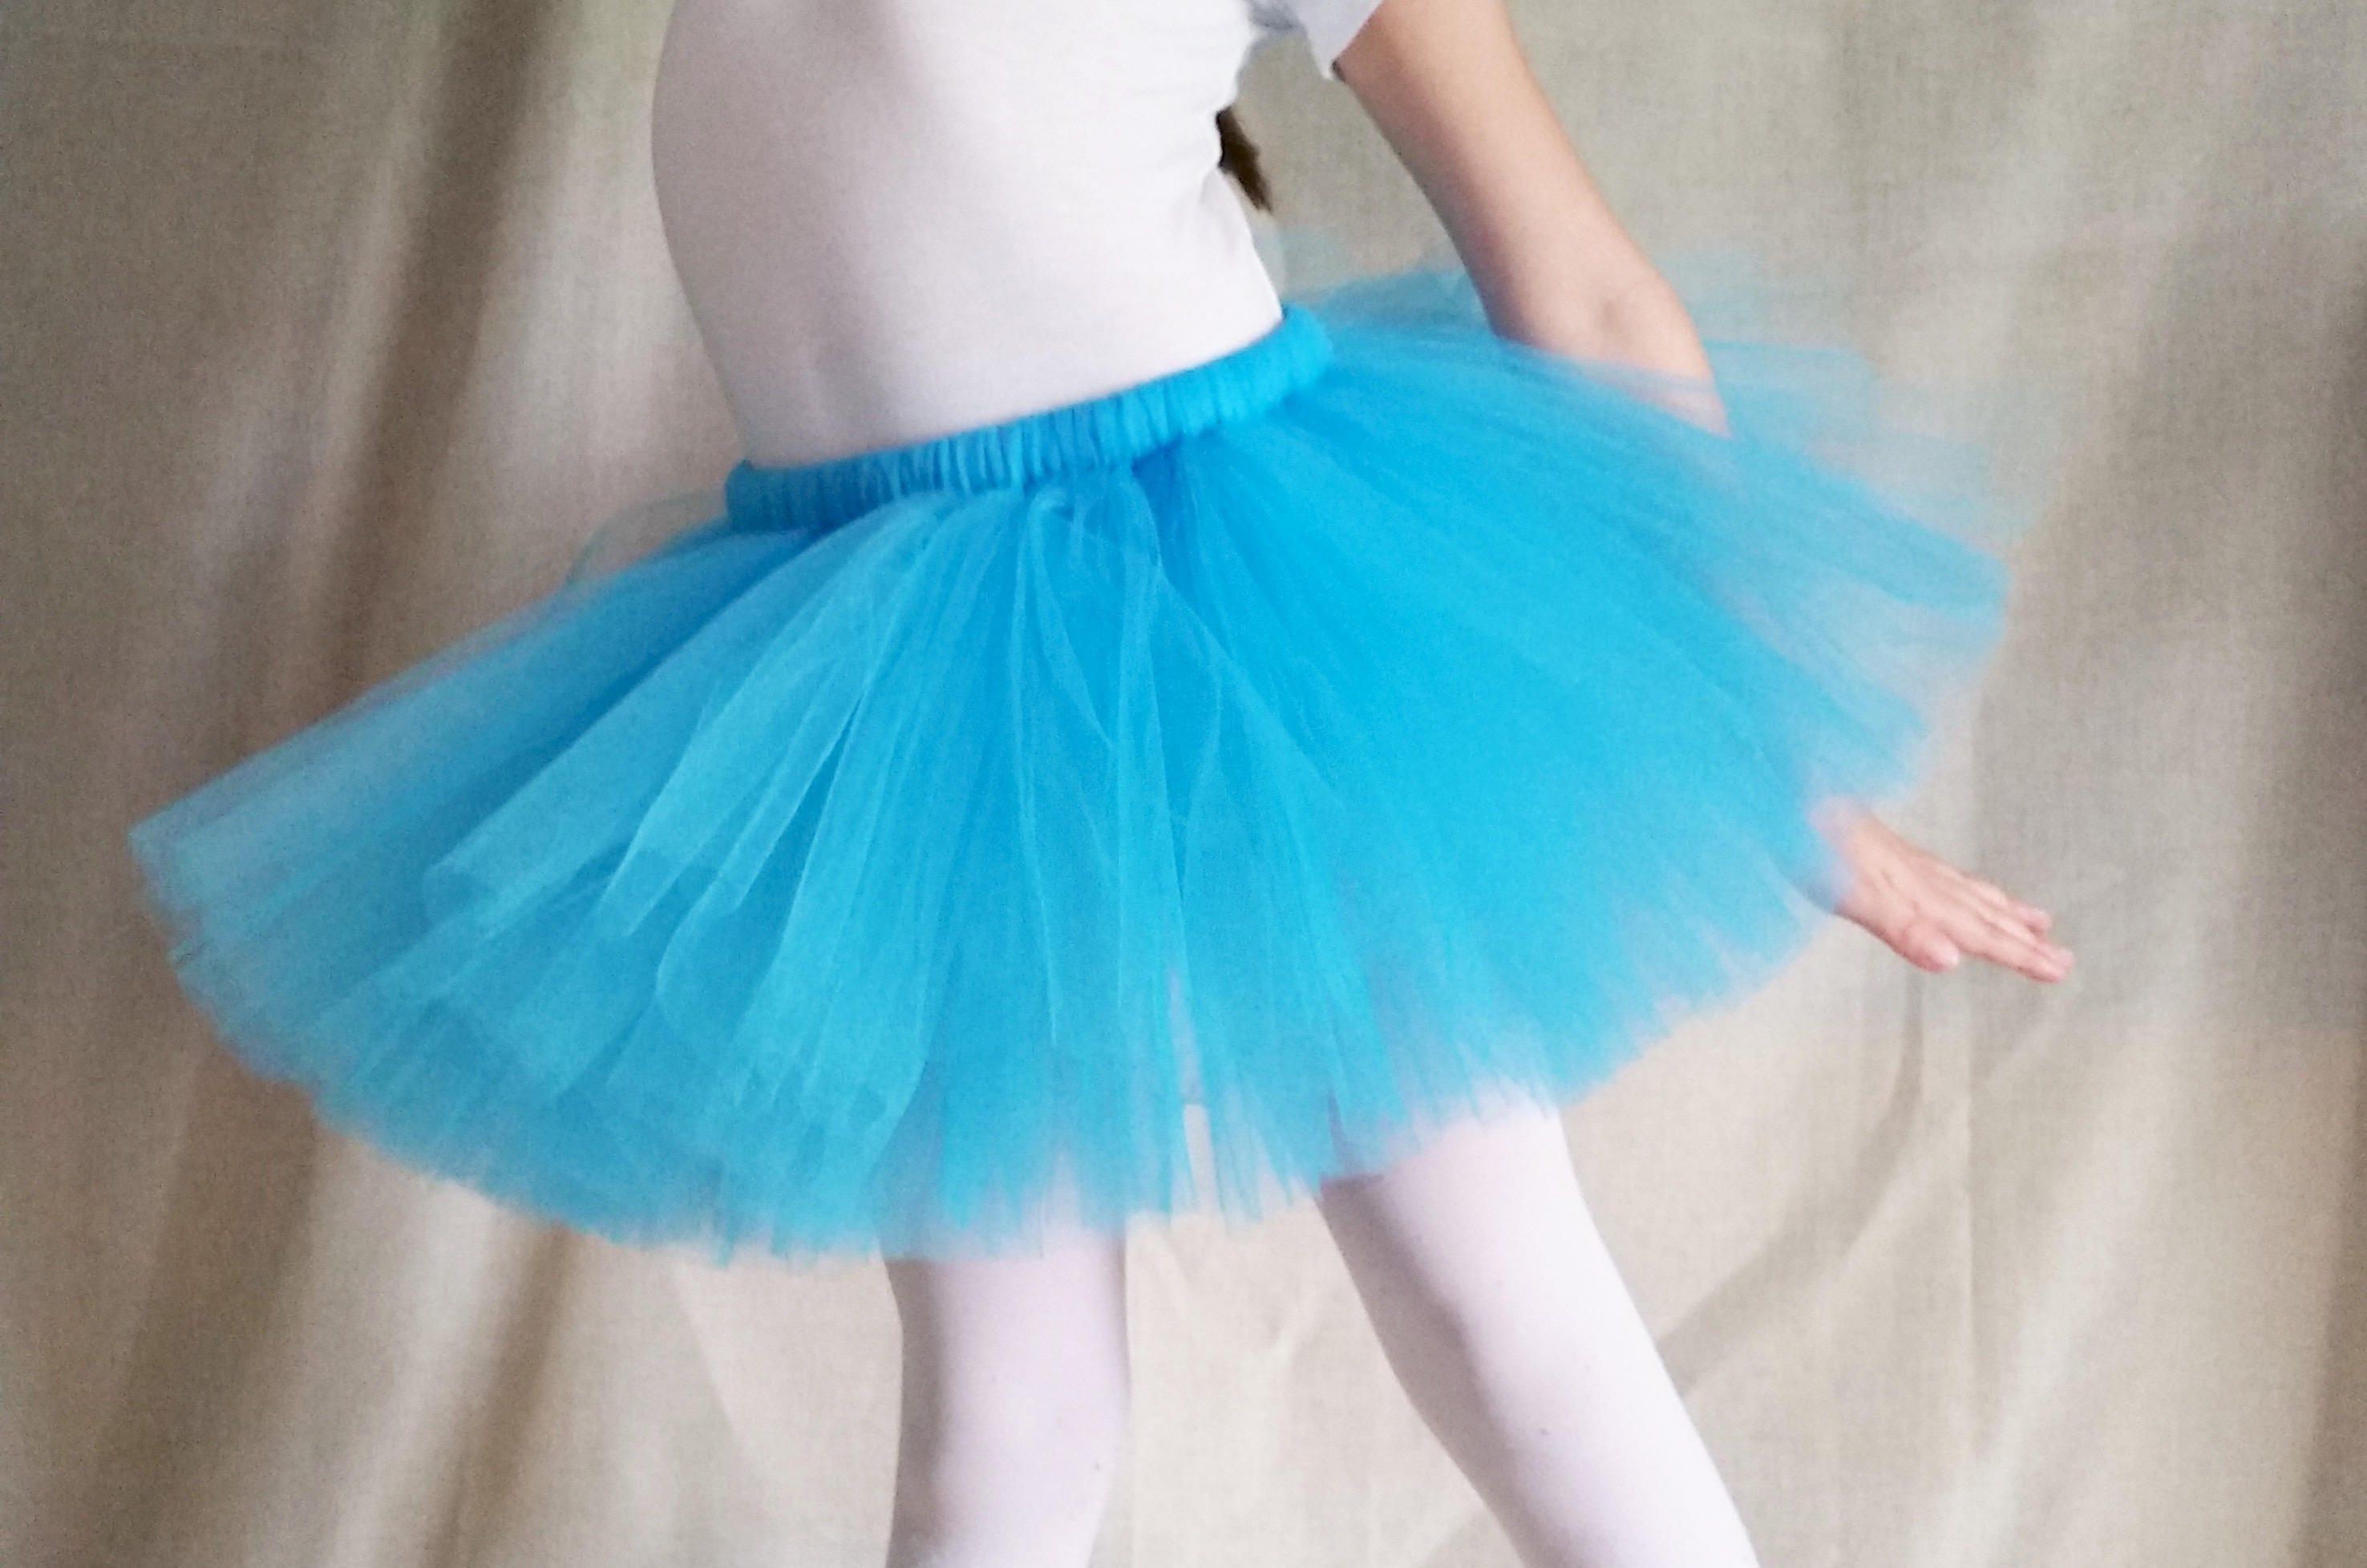 83c1df958c Turquoise Tutu, Blue Tutu, Birthday Party Outfit, Photo Prop Tutu, Baby  Shower Gift, Bright Blue Theme Tutu, Costume Tutu, Halloween